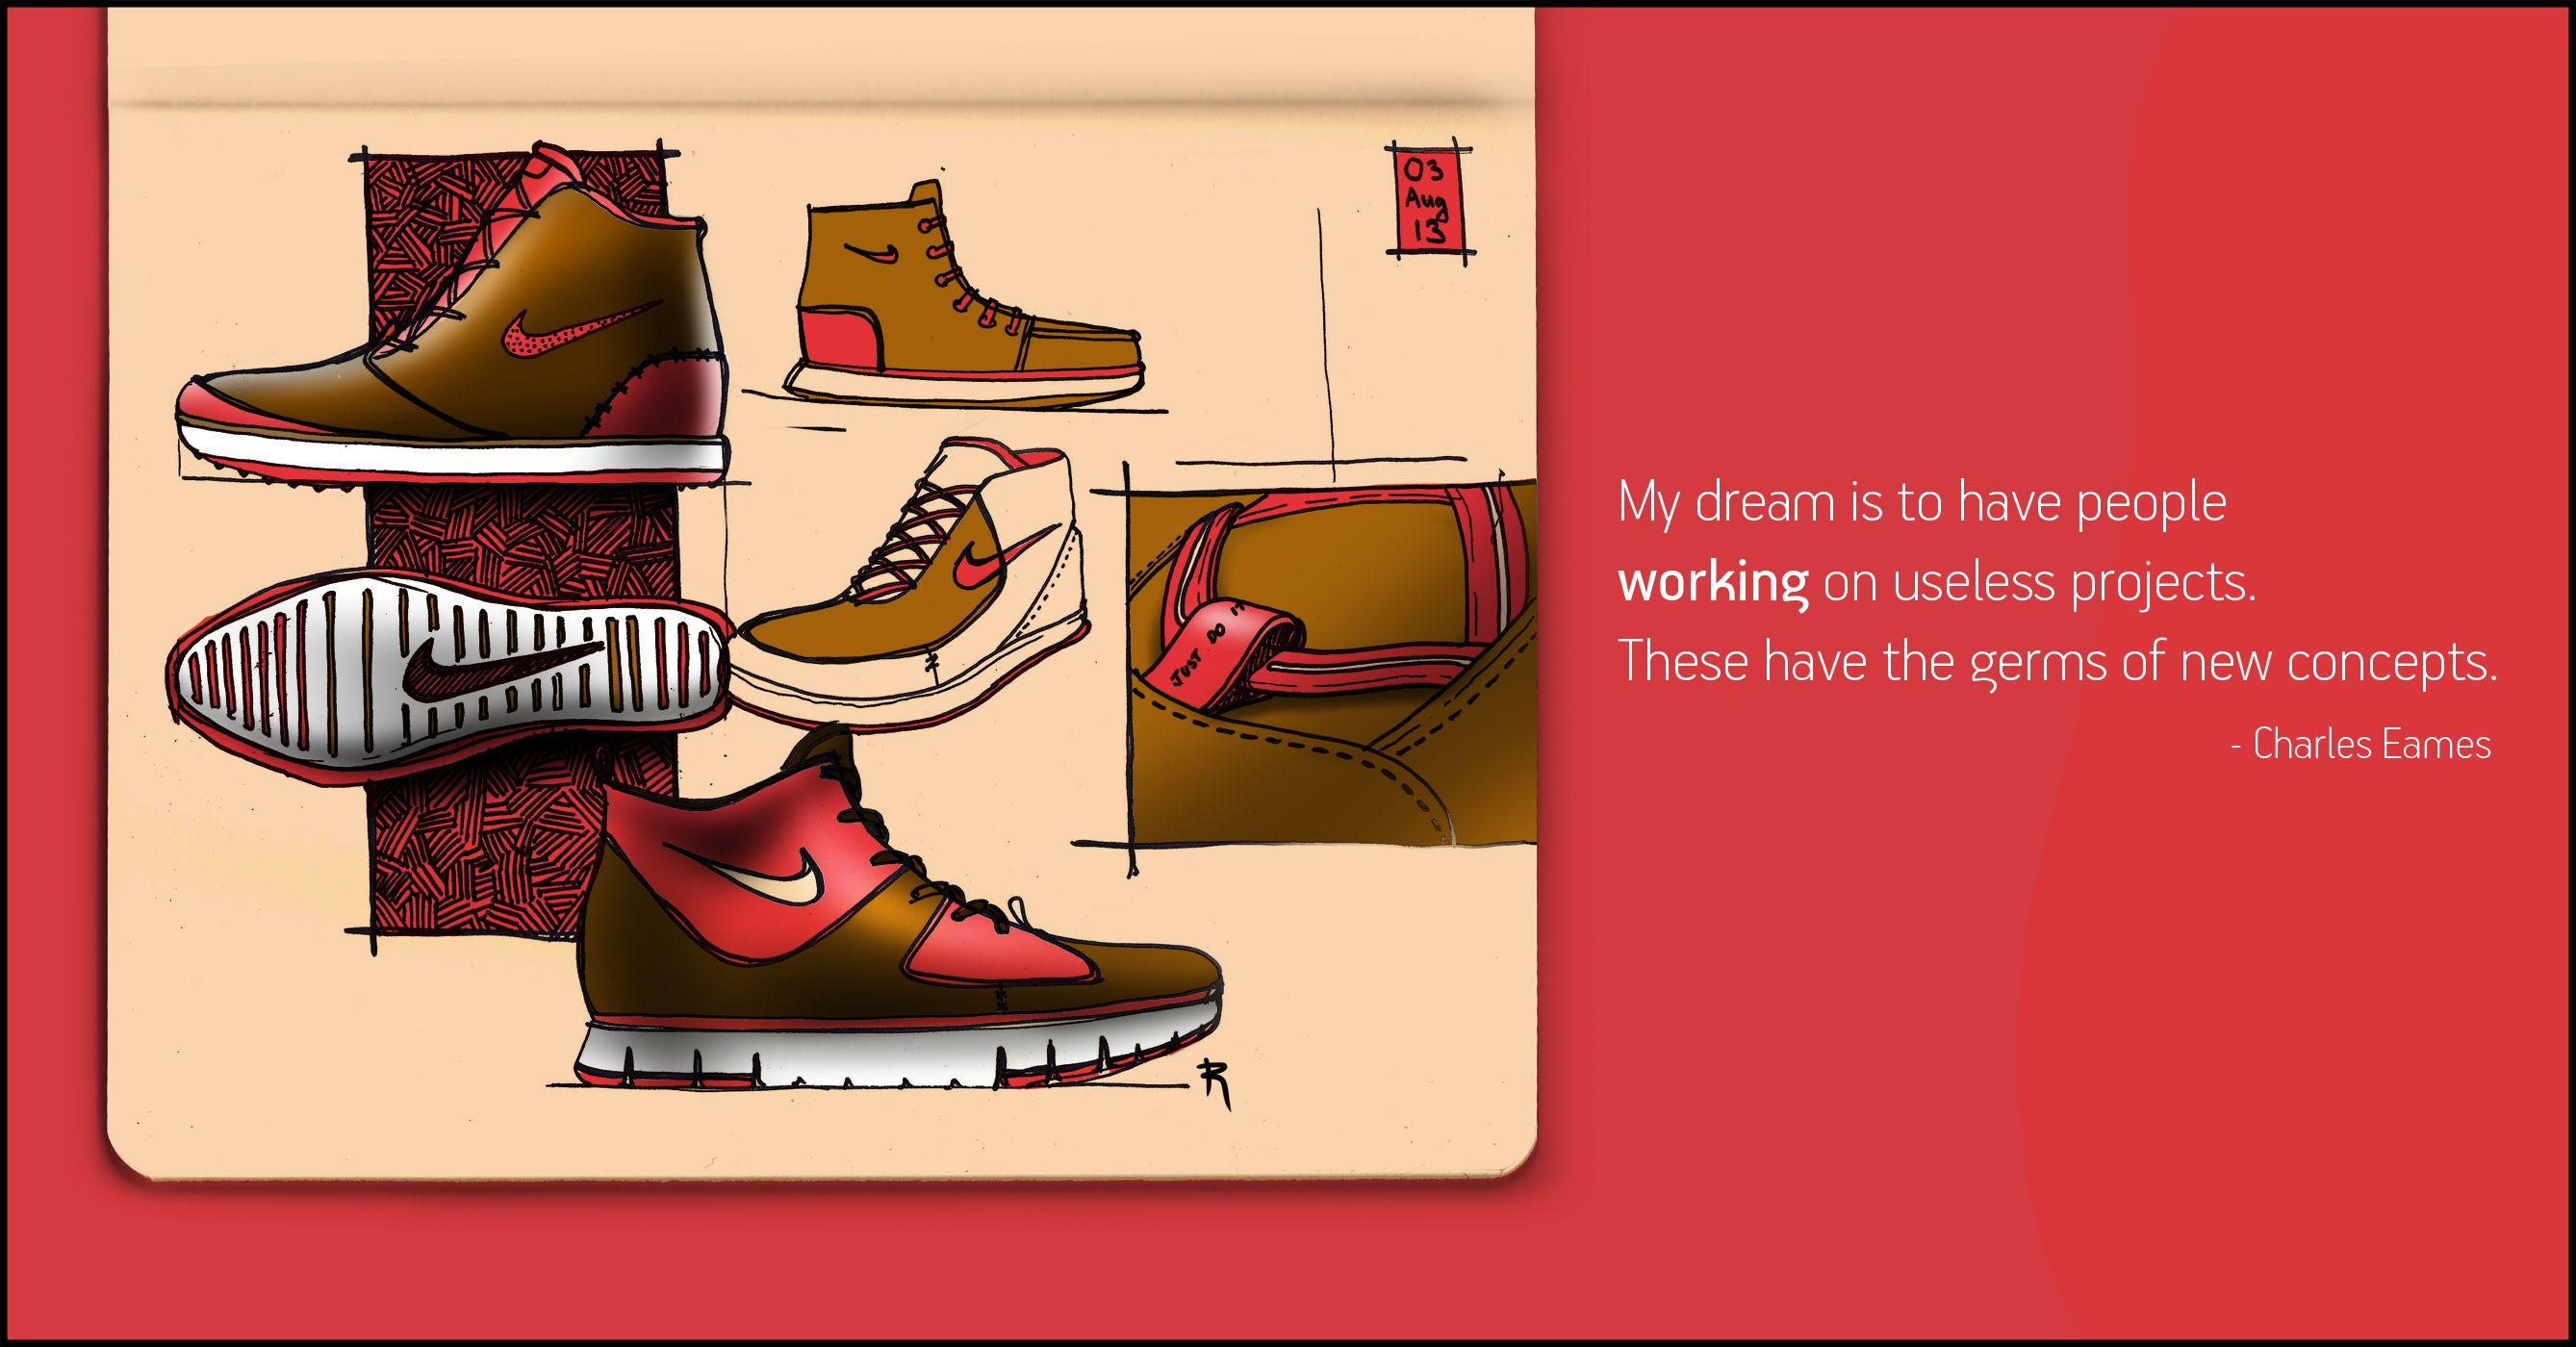 #Roshan #Hakkim #SketchBug #Nike #Boots #Shoe #Shoes #design